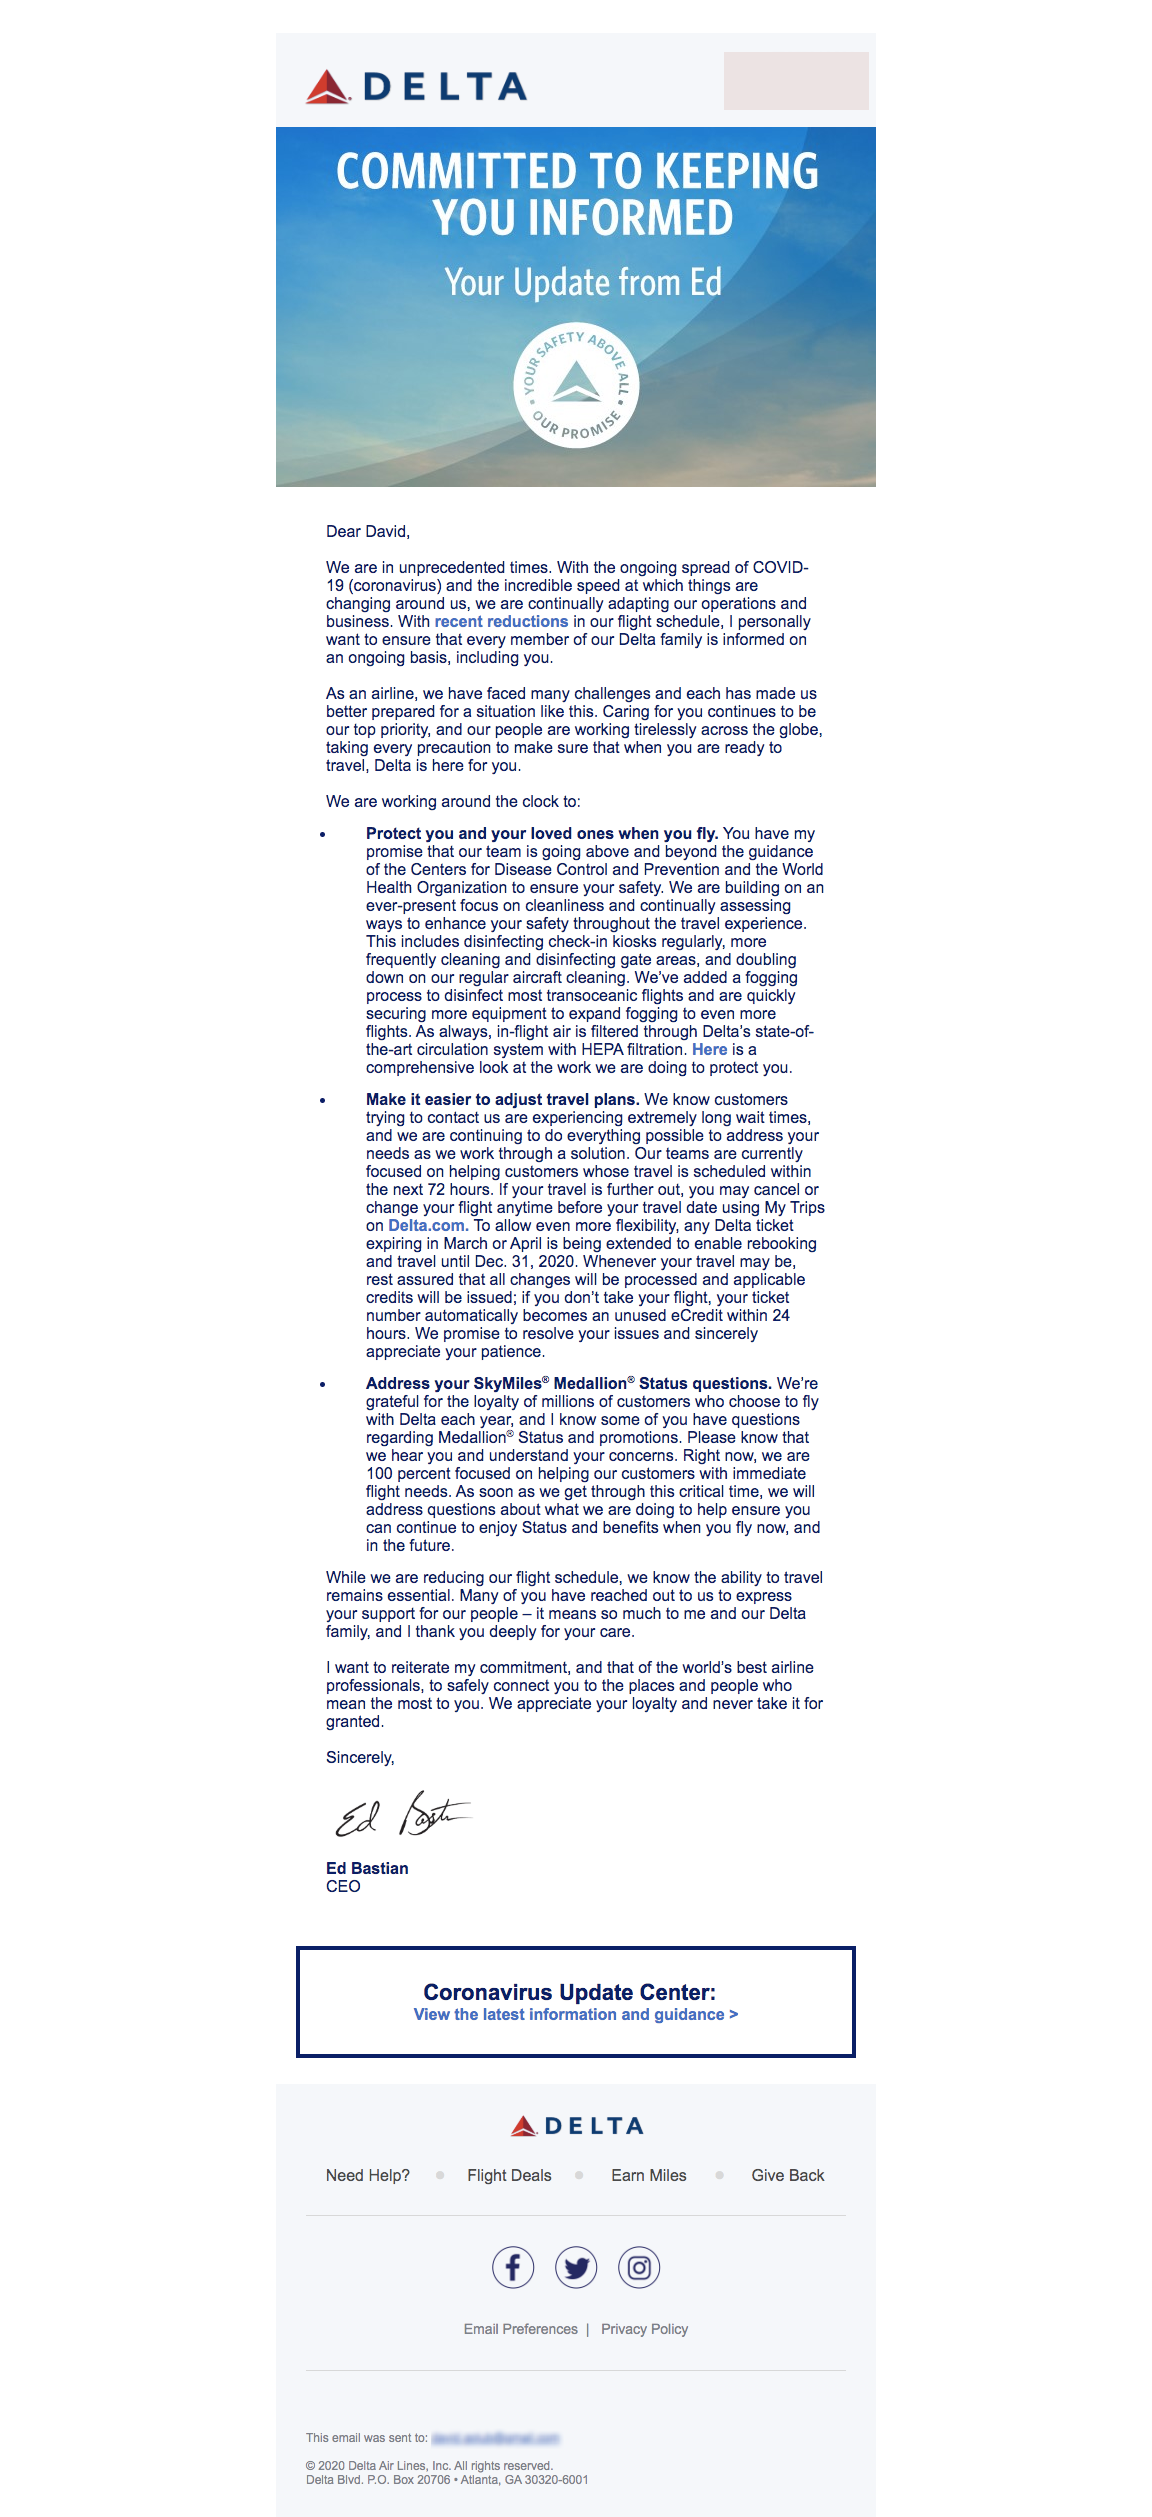 Delta Coronavirus Crisis Communication Email